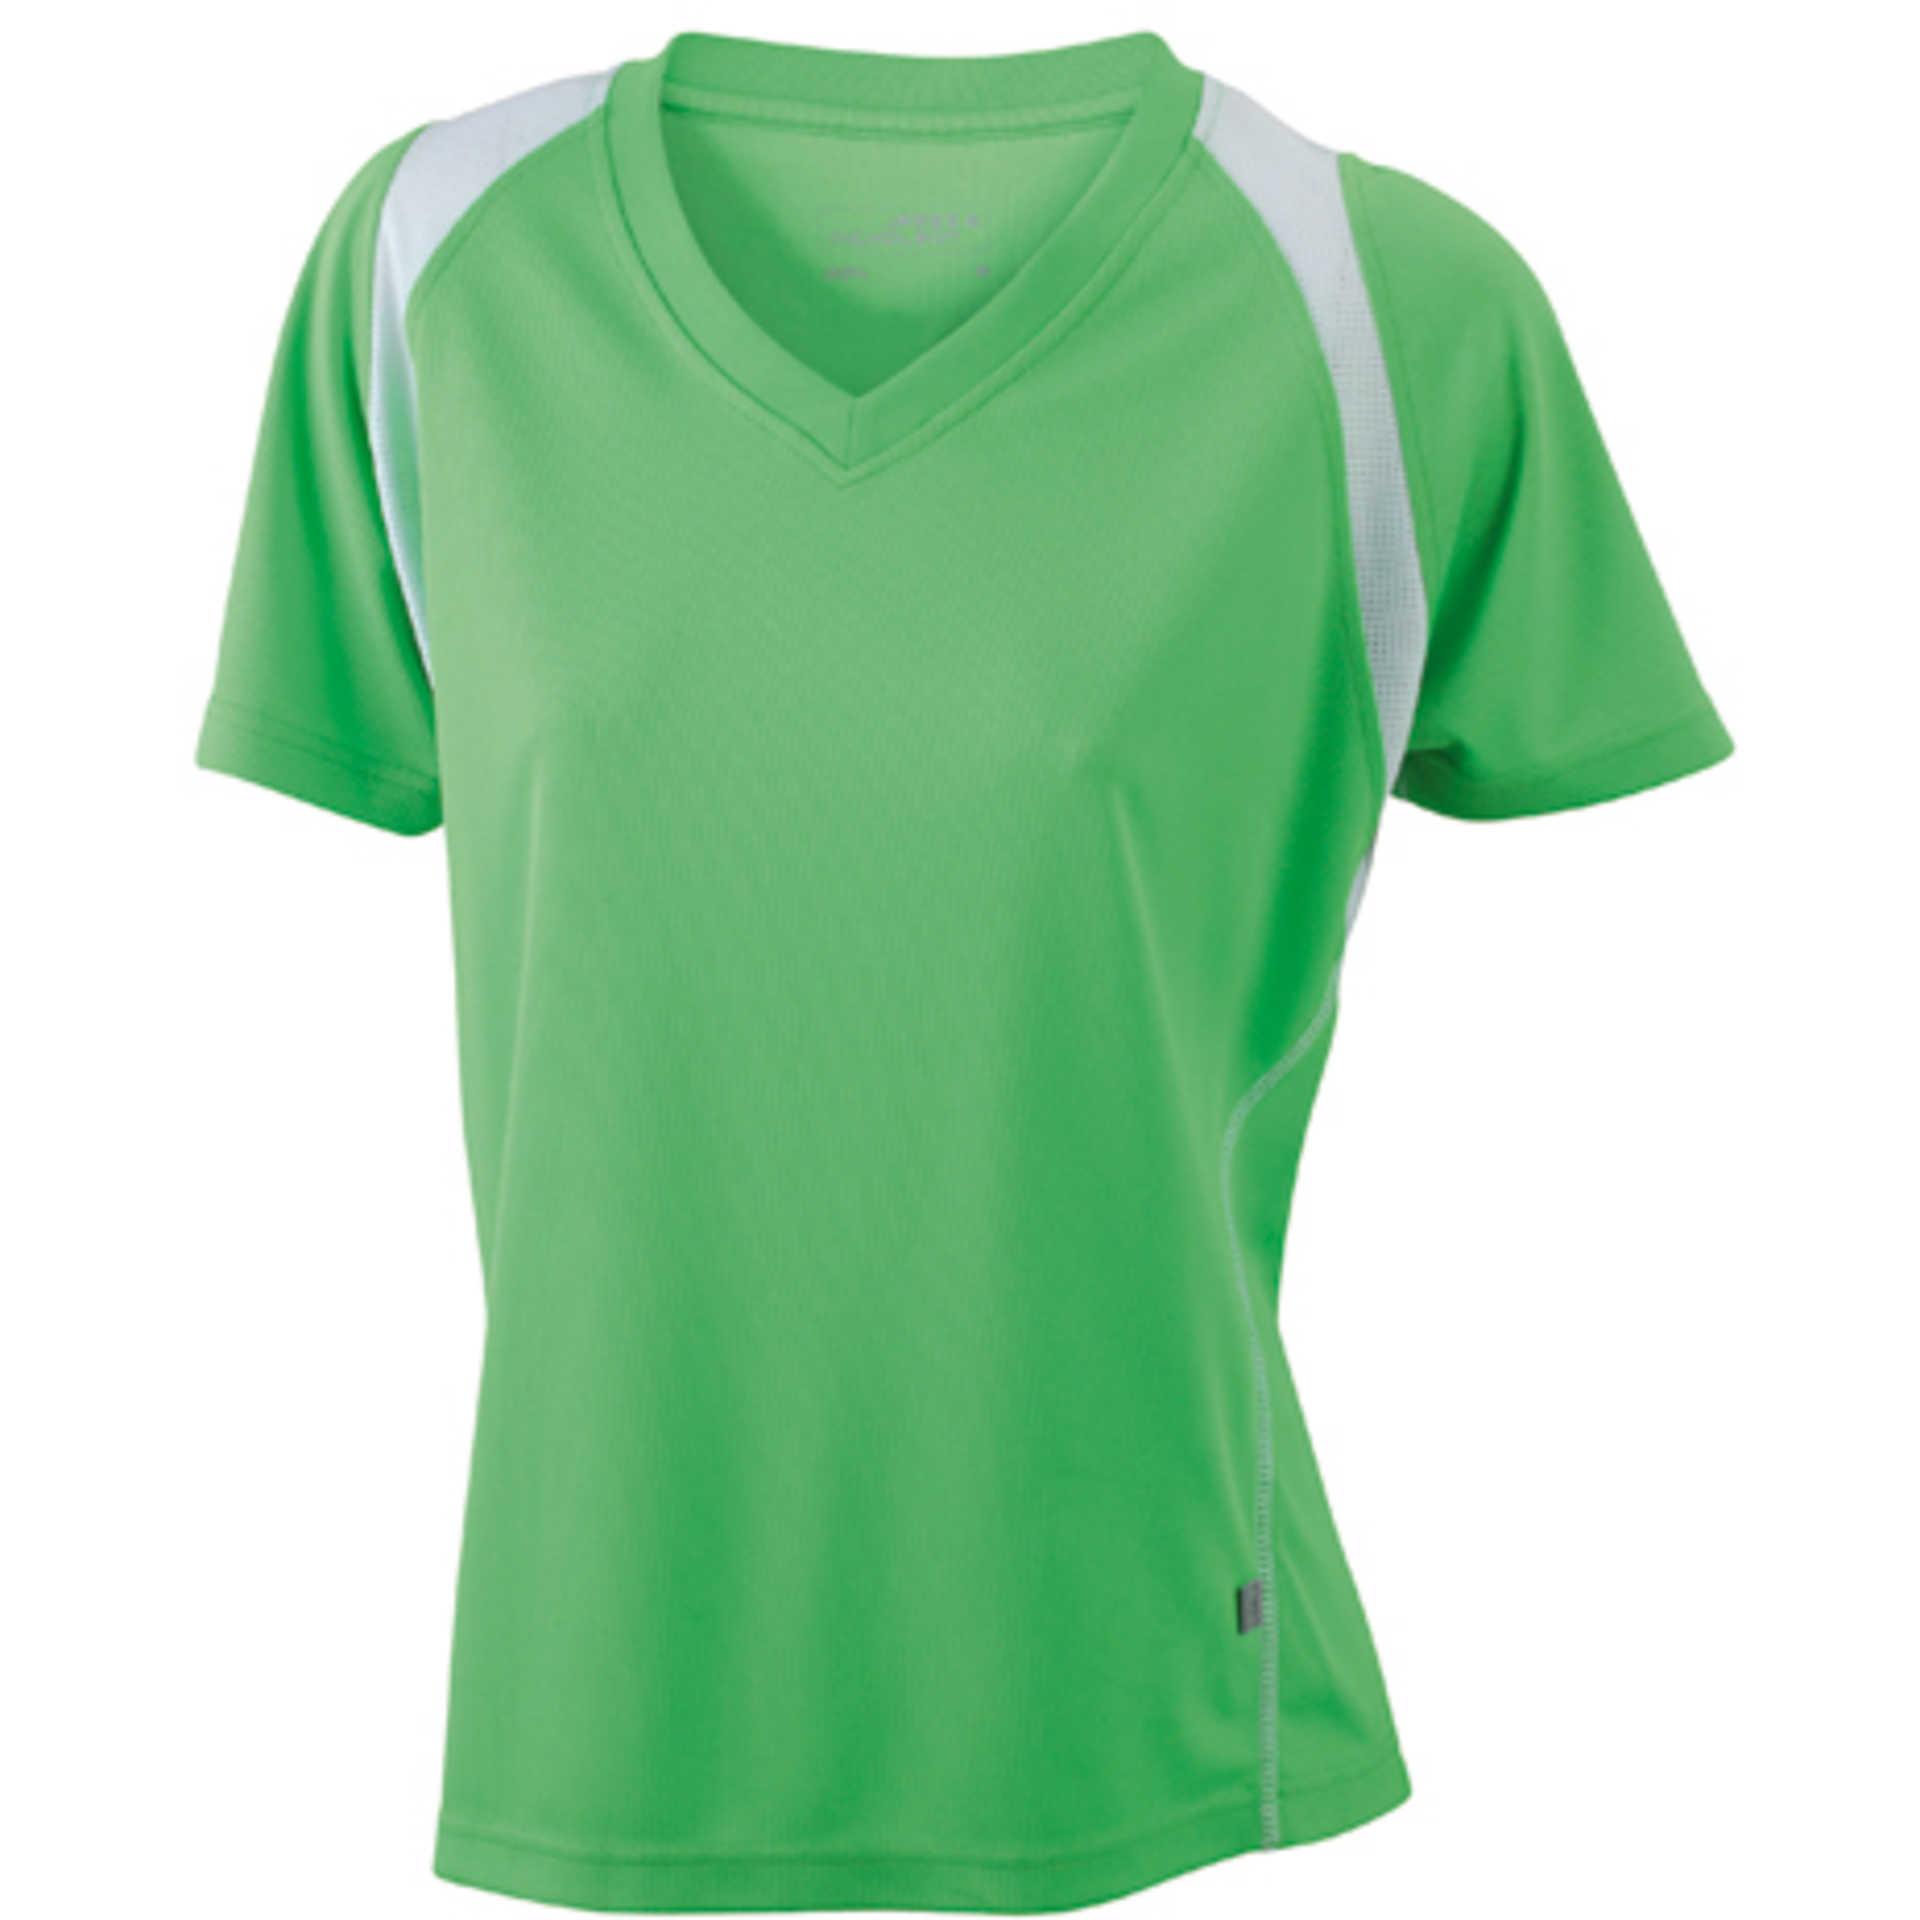 tee shirt personnalis ladies 39 running t james nicholson lime green white. Black Bedroom Furniture Sets. Home Design Ideas